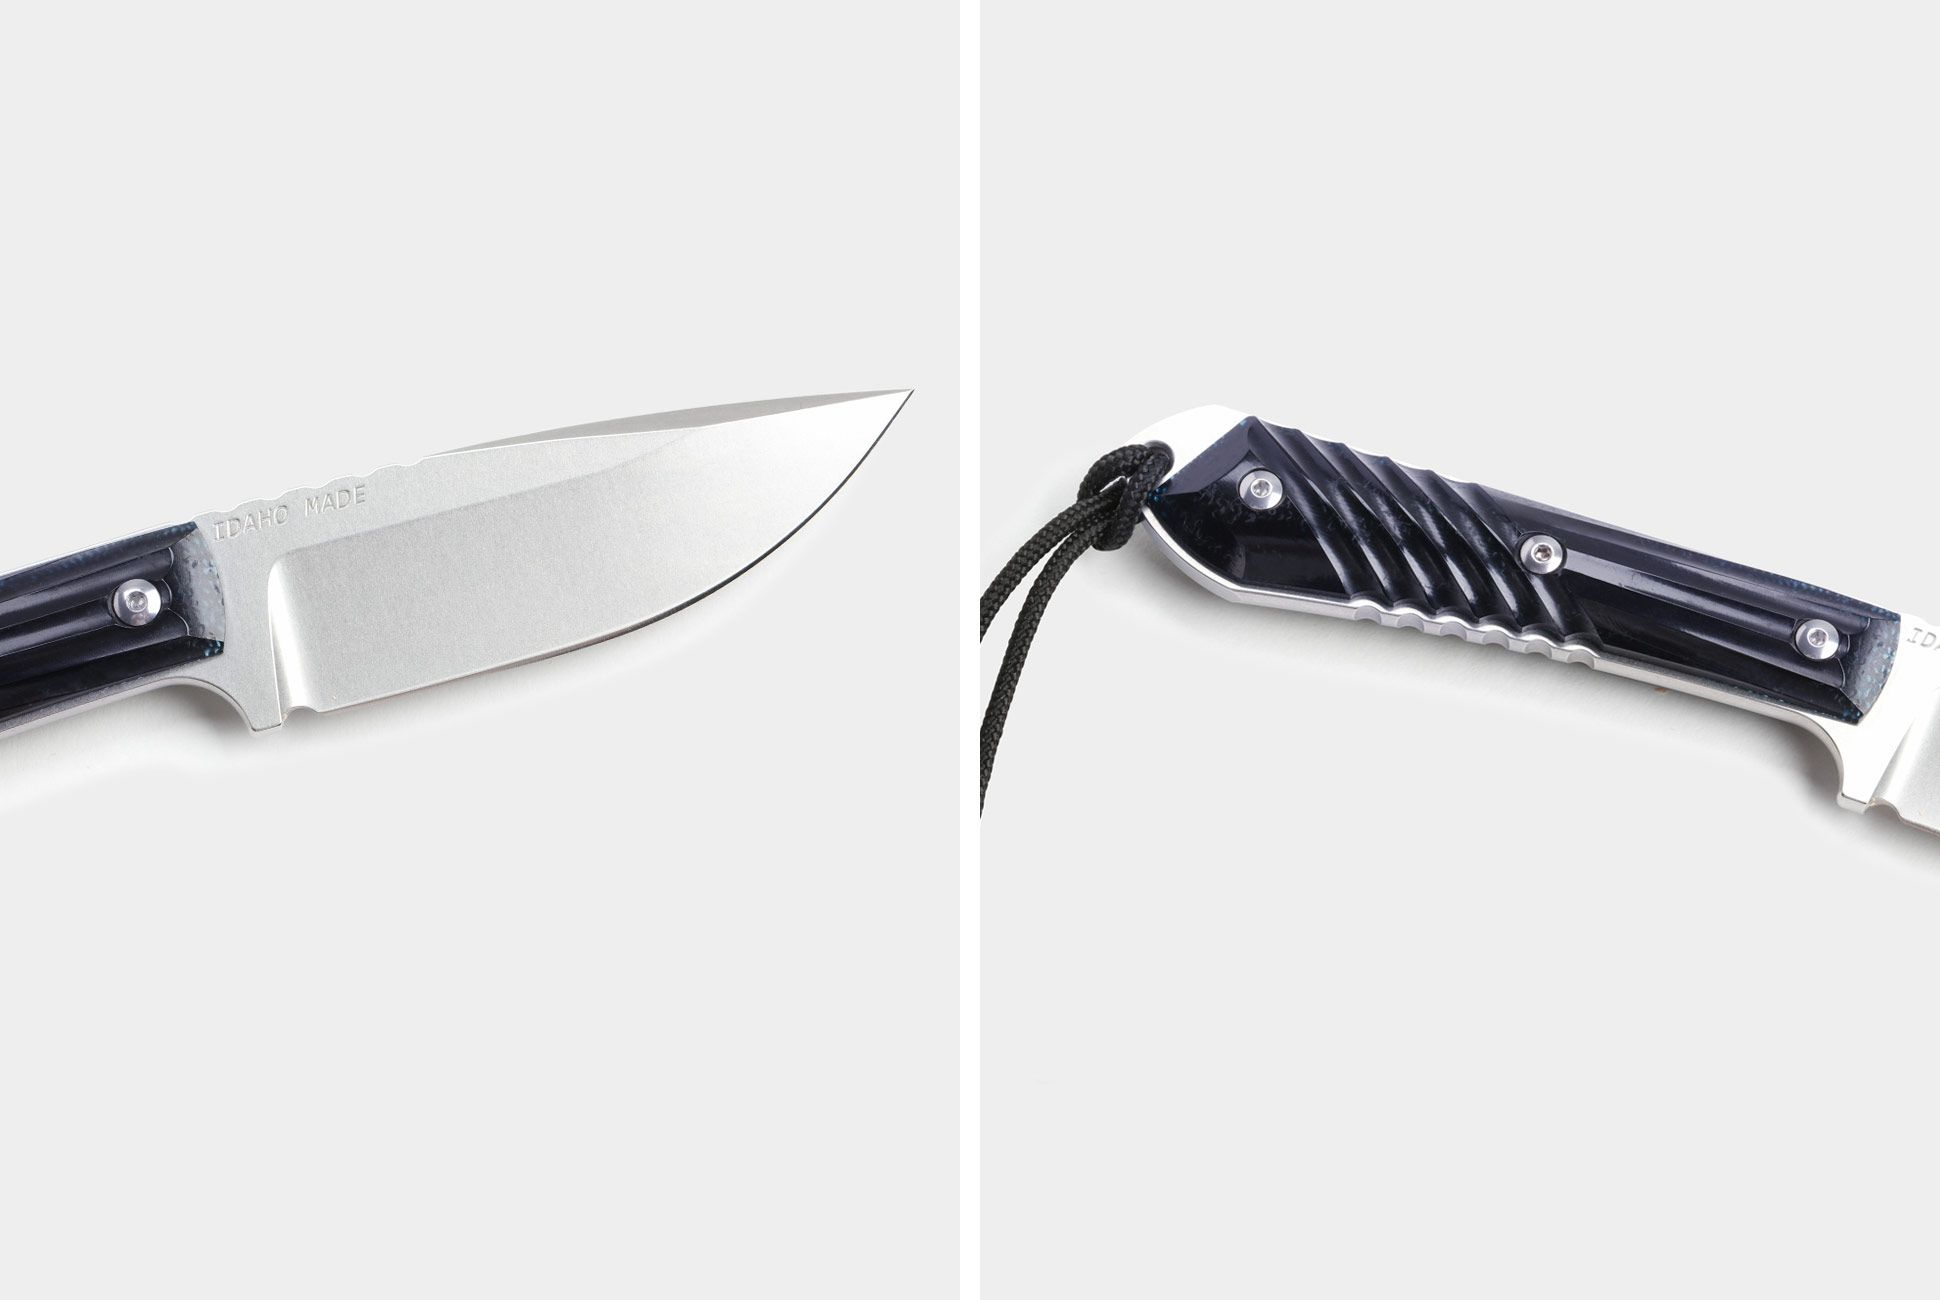 Best-Made-Nyala-Knife-gear-patrol-2-full-lead